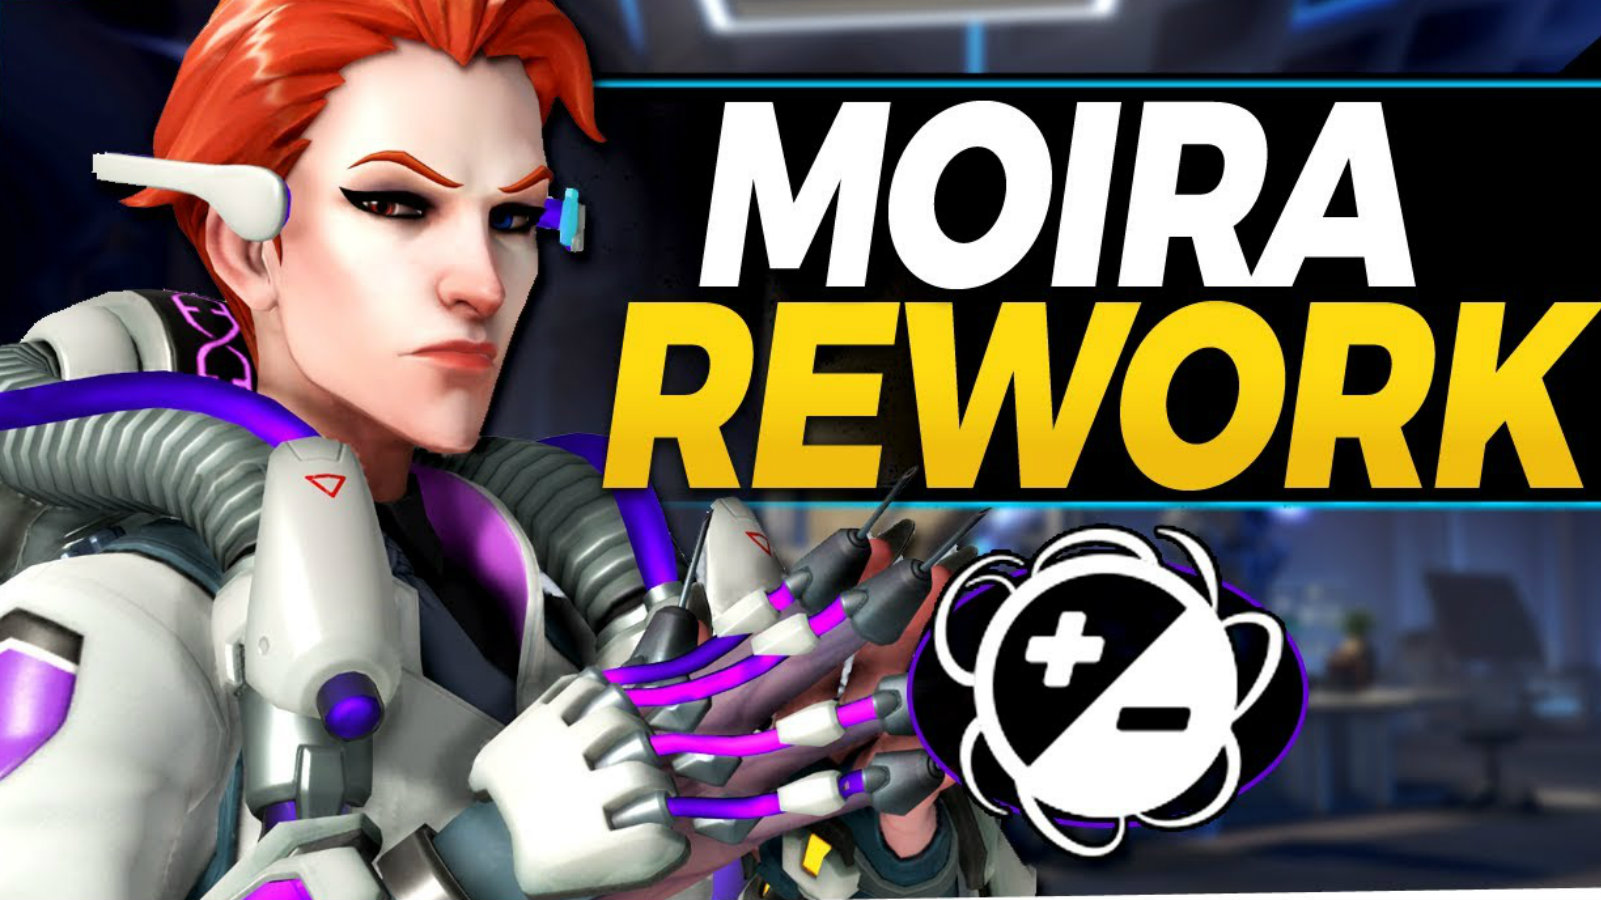 A Moira Rework screen